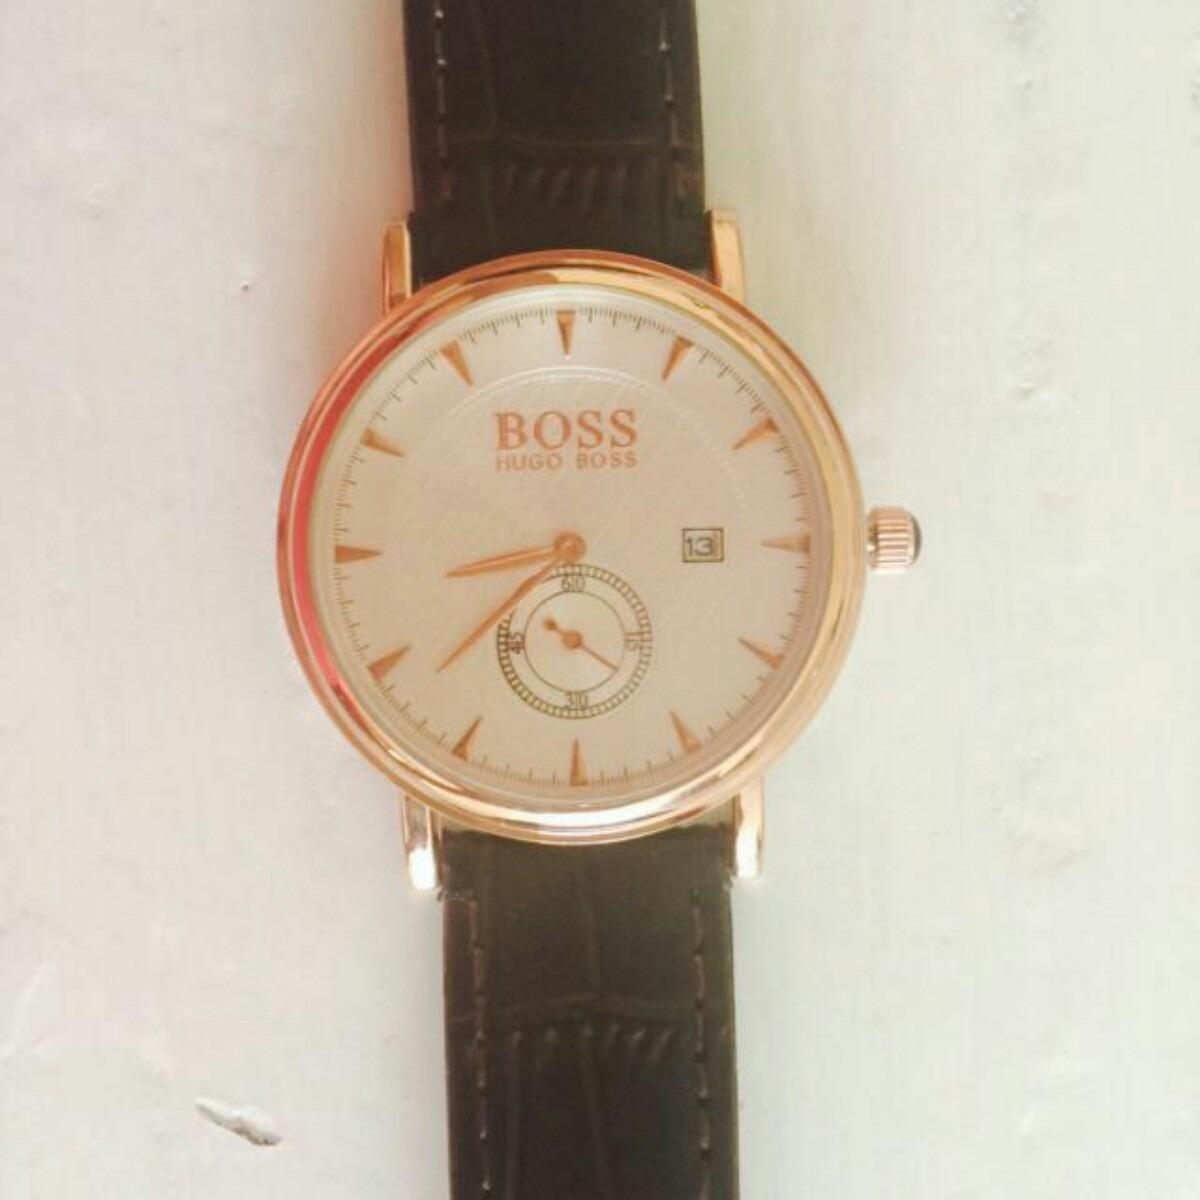 2a64b3e15334 reloj hugo boss mercado libre mexico